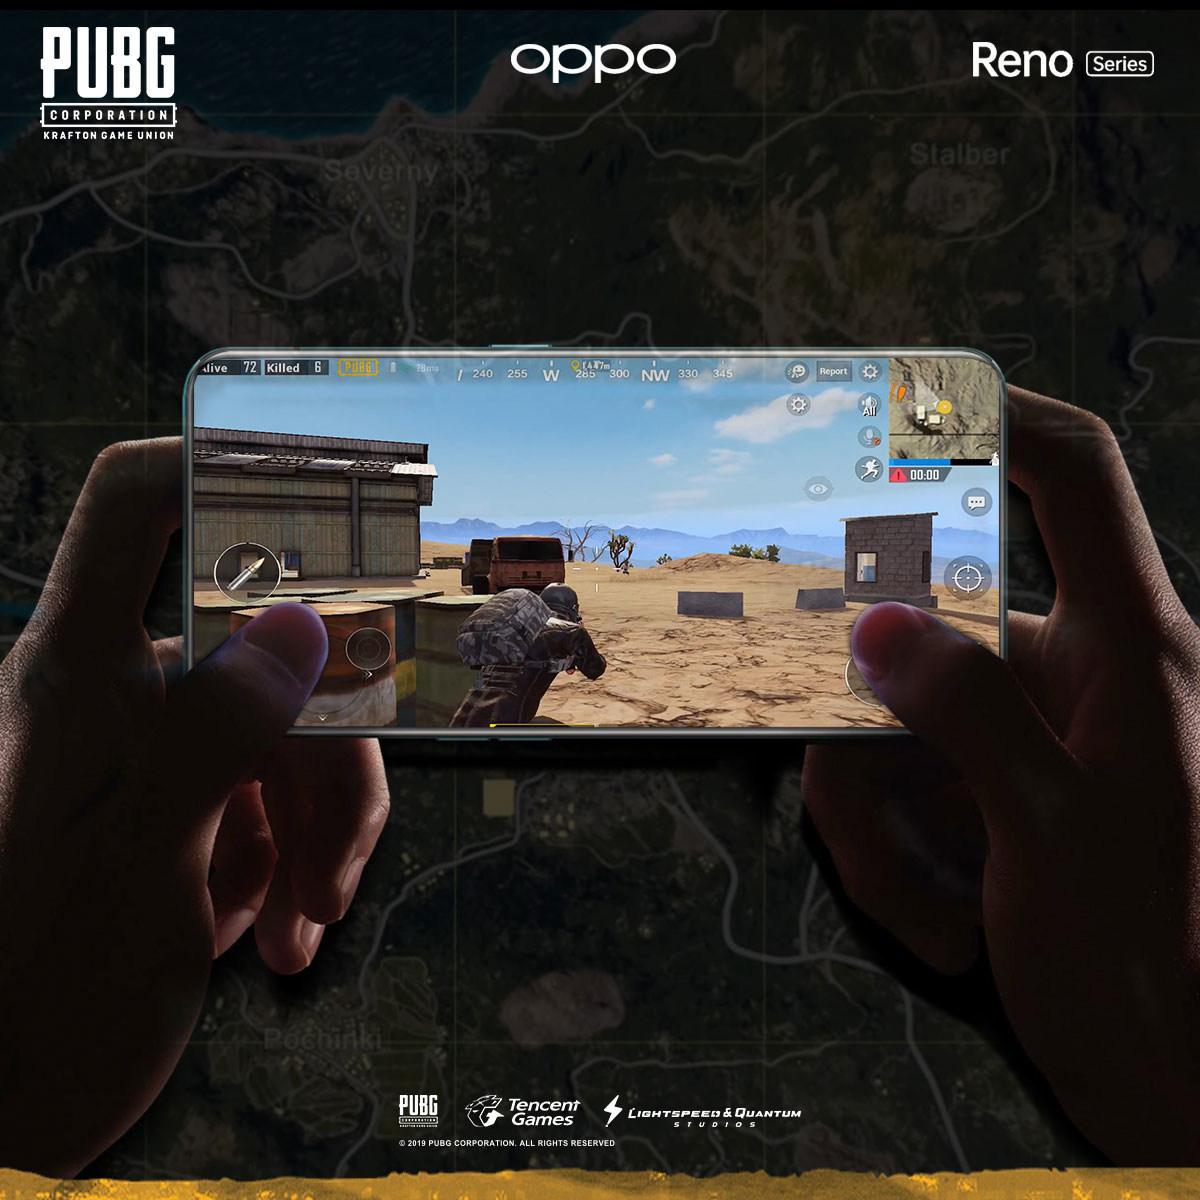 OPPO Announces Sponsorship of PUBG MOBILE MENA Championship 2019